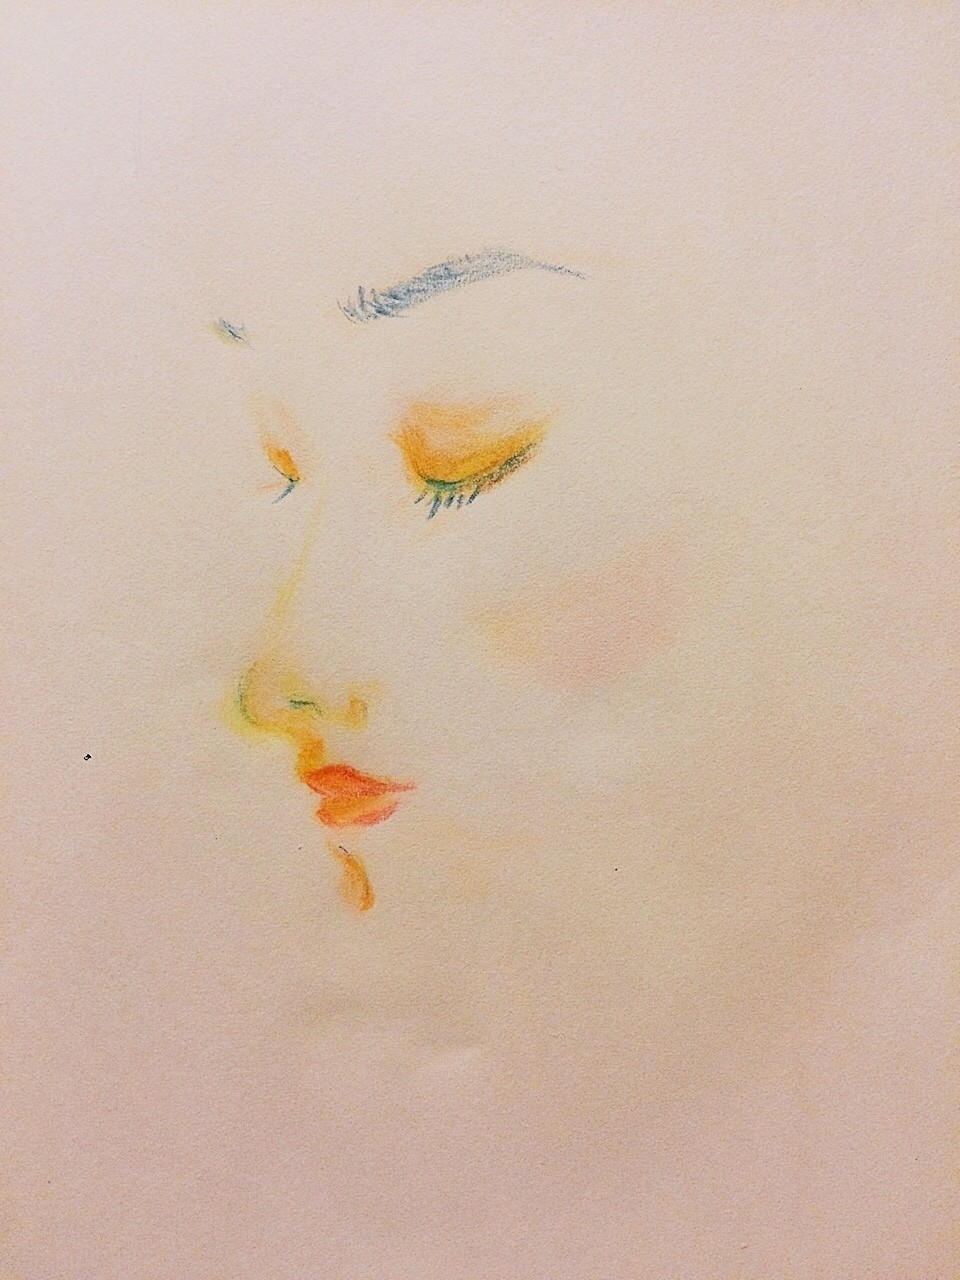 #illustration#art#portrait#sketch#girl#makeup#cosmetics#rouge#イラスト#メイク#コスメ#横顔